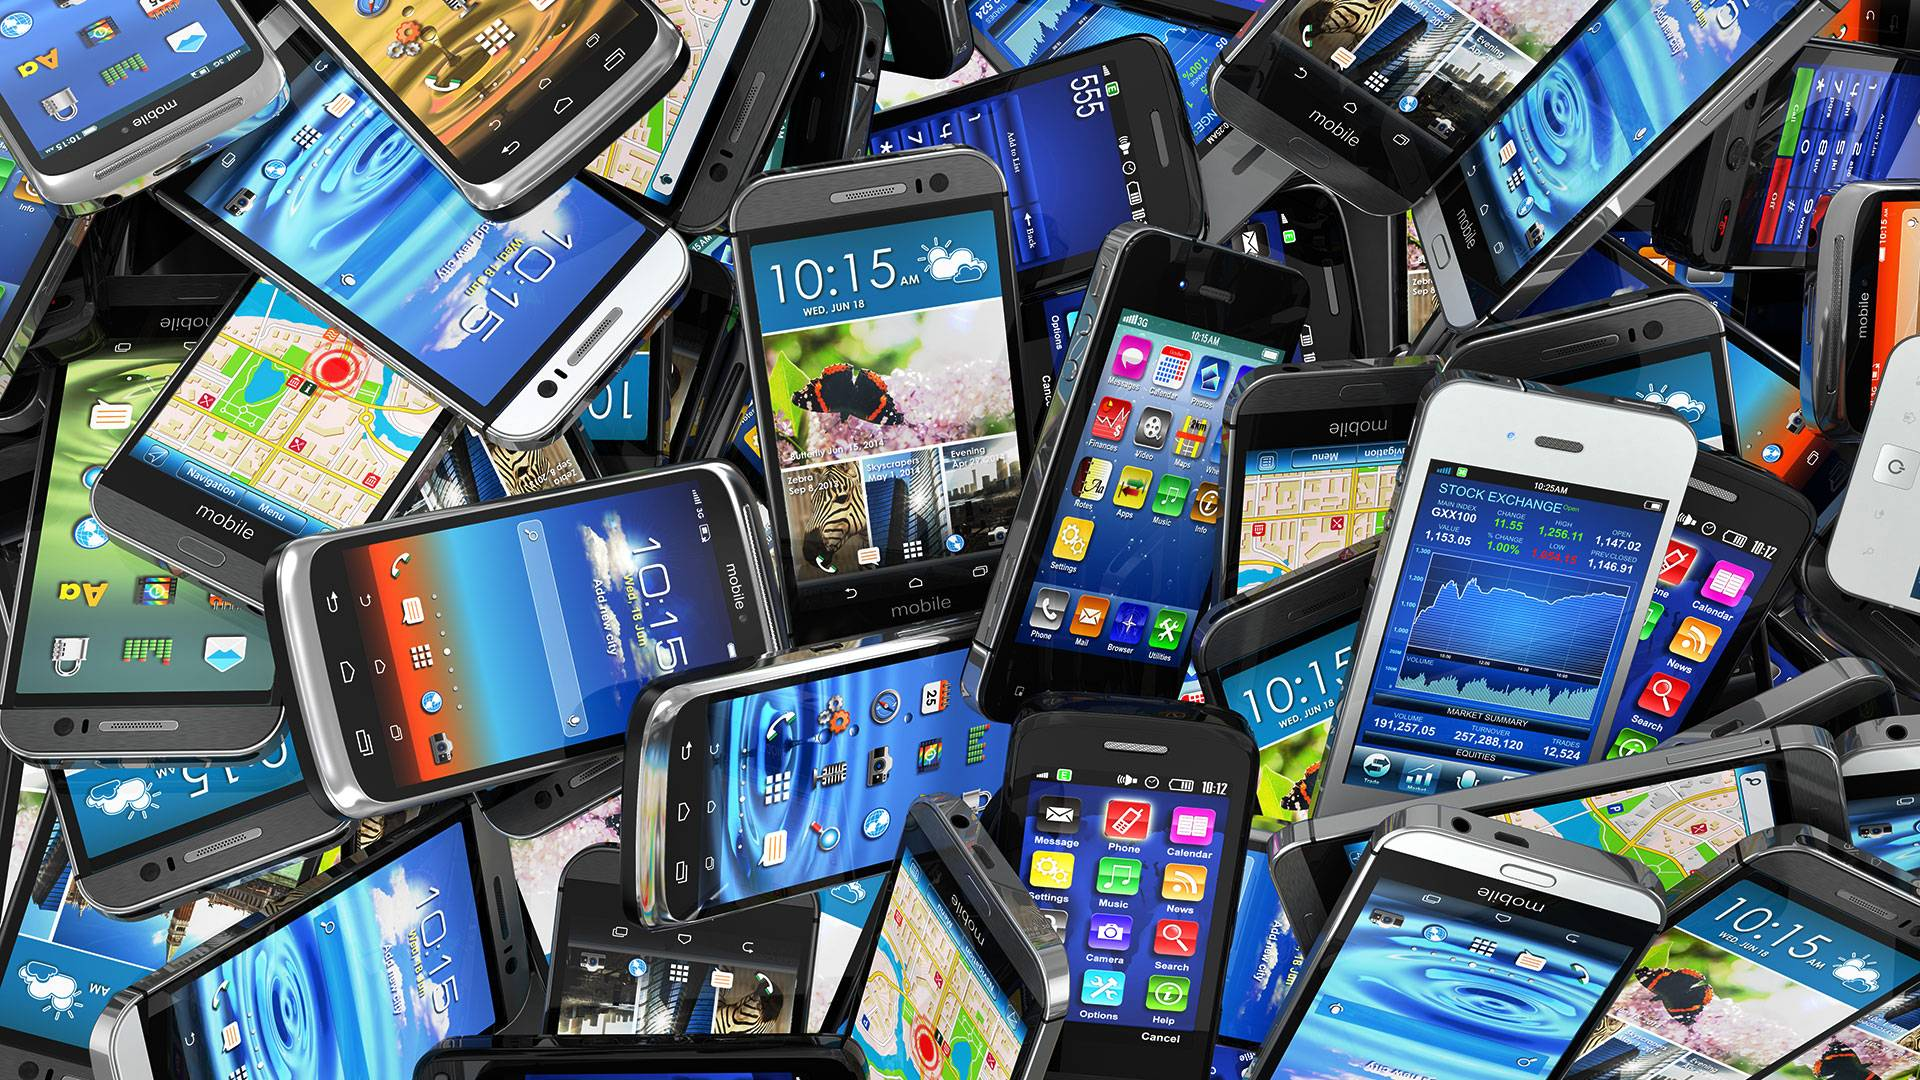 mobilesmartphonespiless1920-eb967b5e37cec31077065f444bd7cafe.jpg